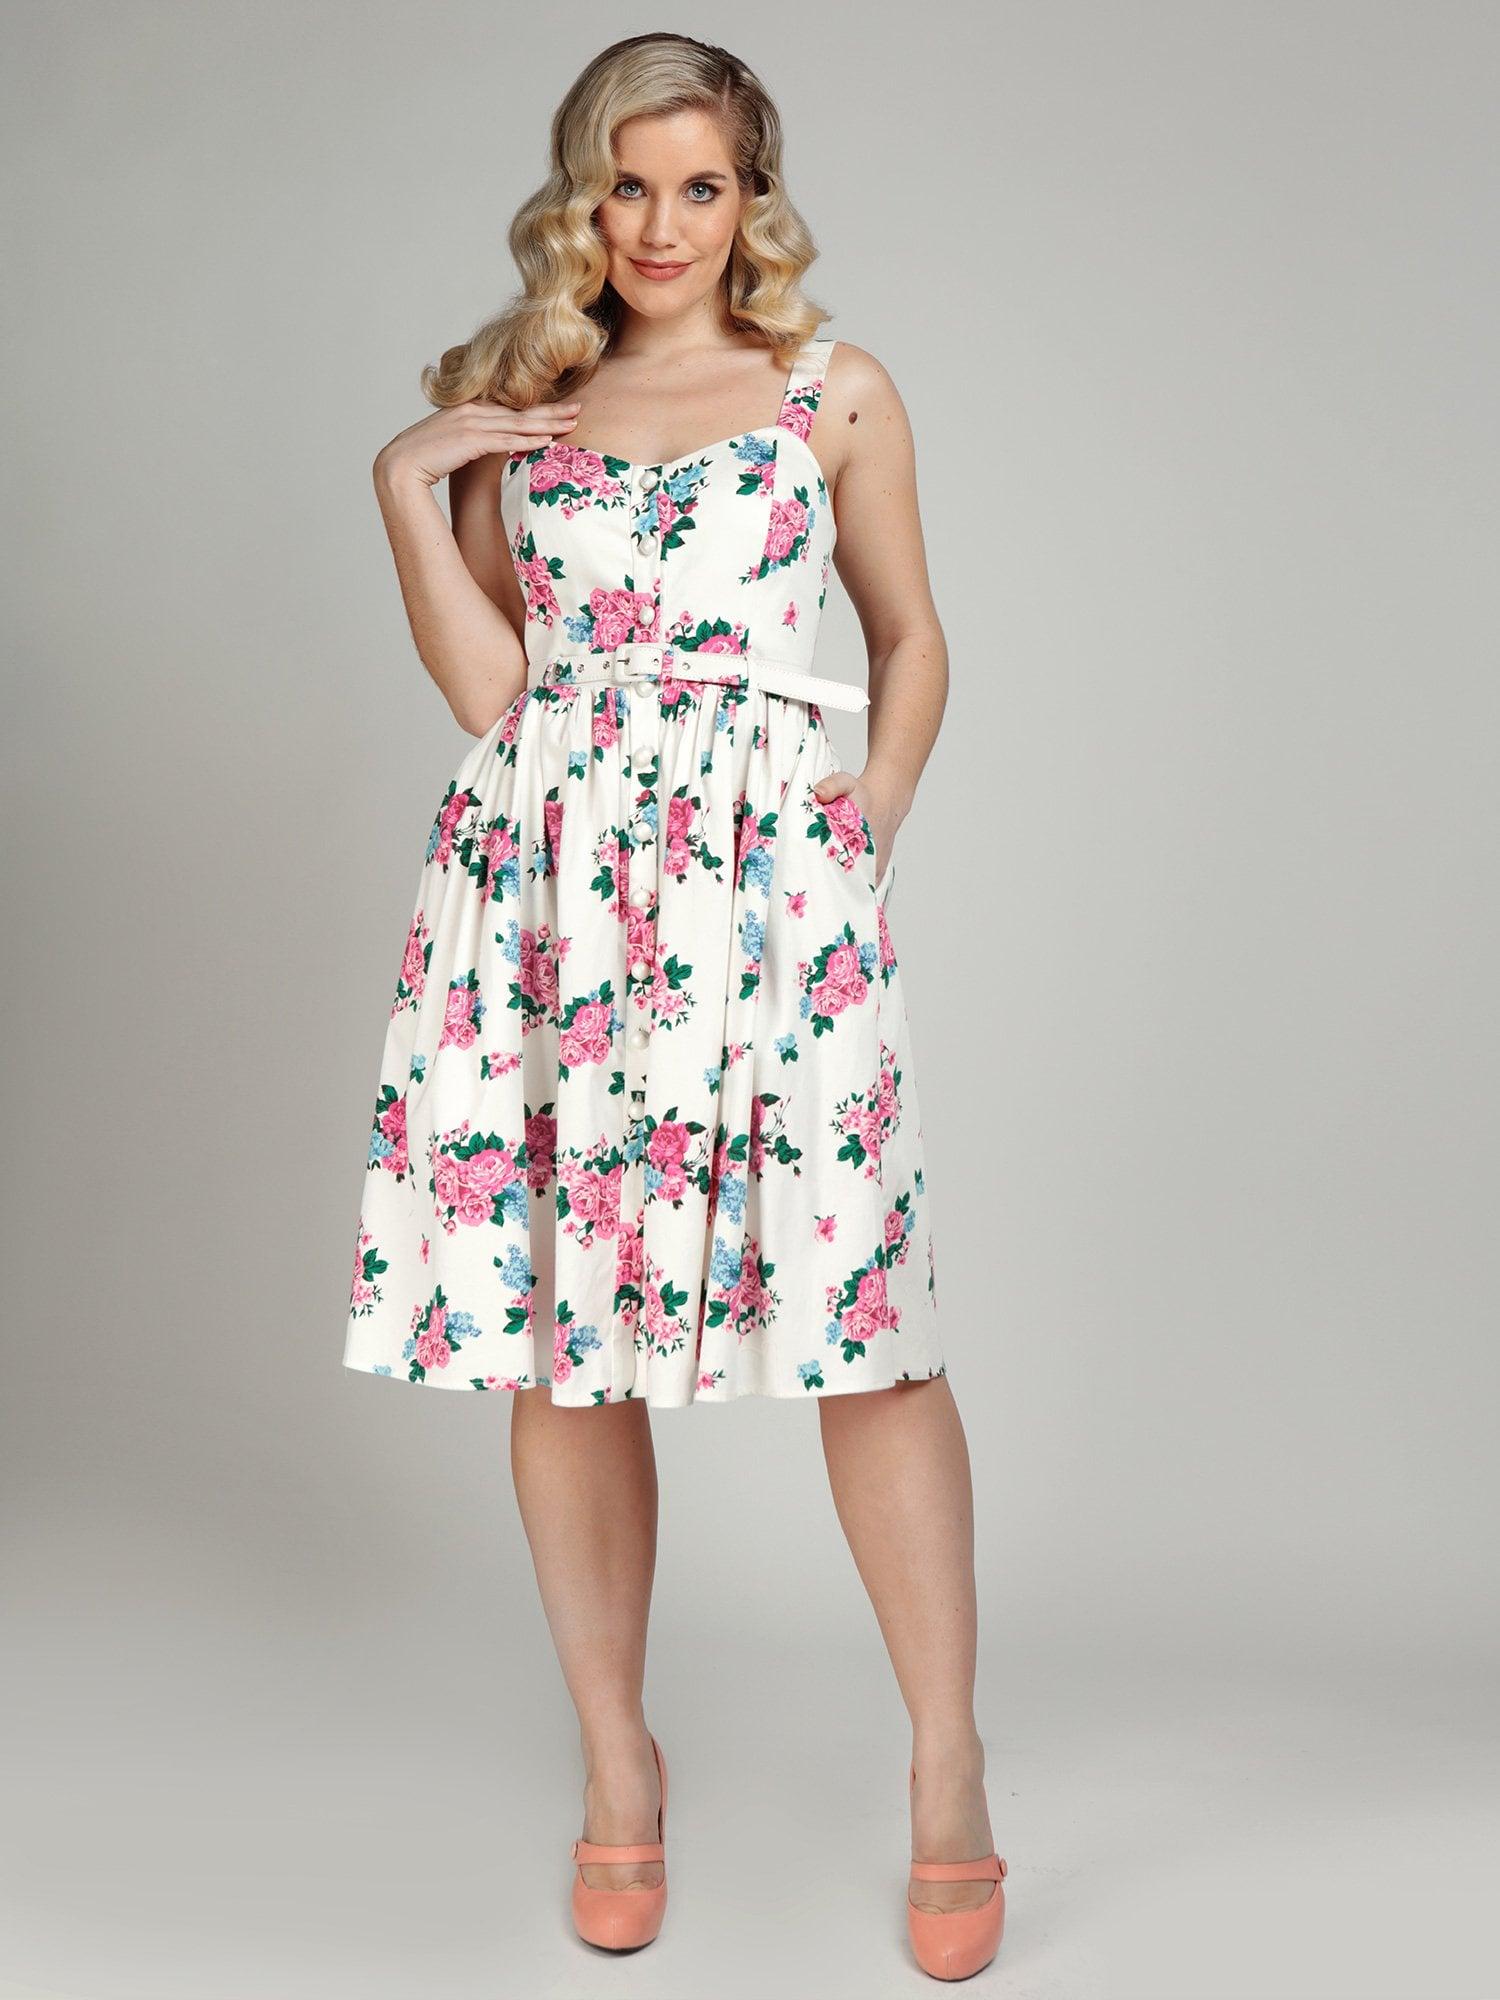 Jamima Floral Swing Dress